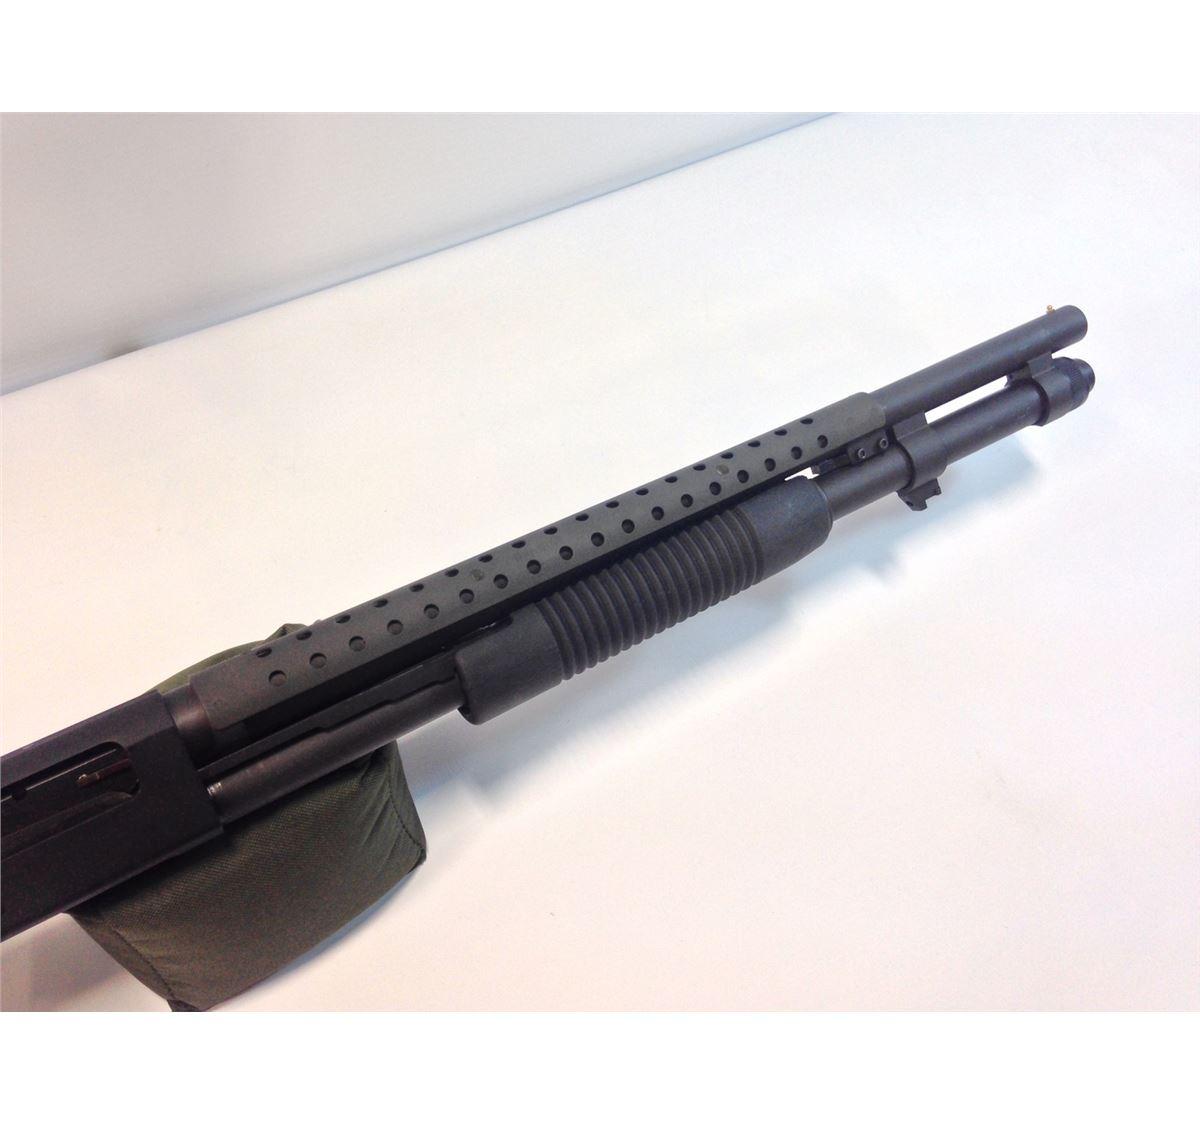 Mossberg 590 (w/ ATI Folding Stock) Heat Shield